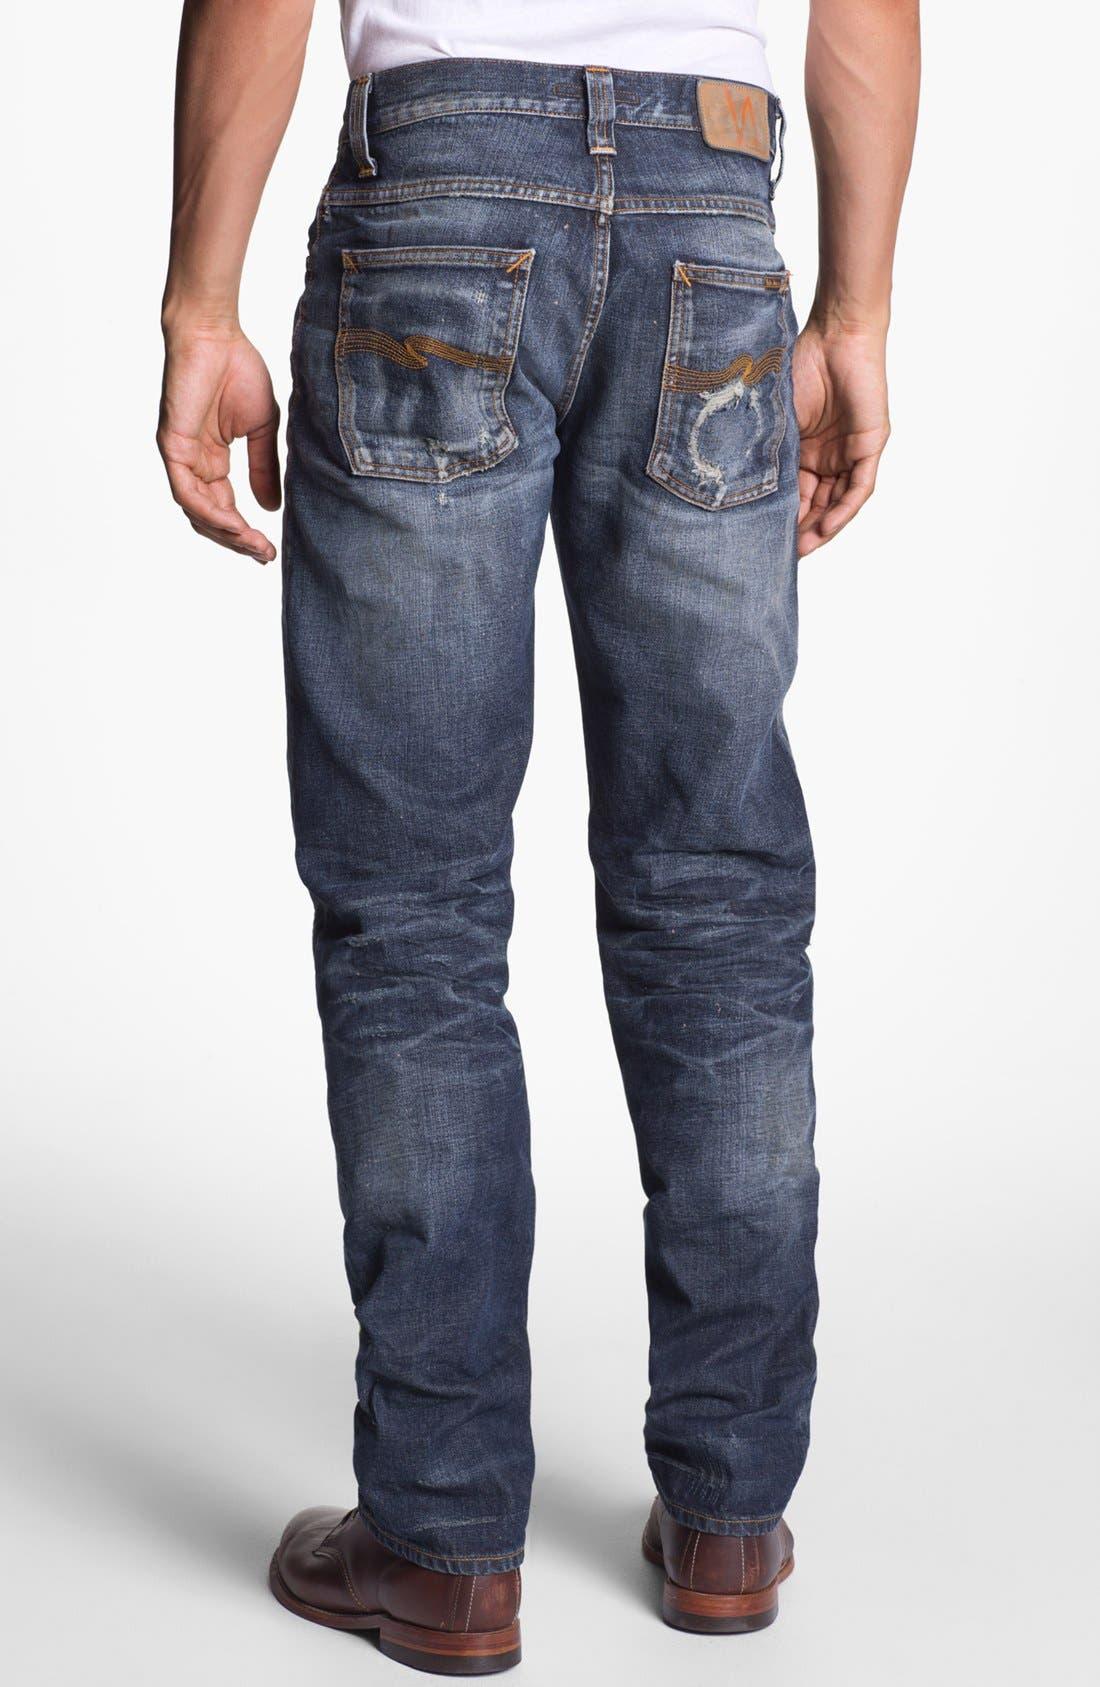 Alternate Image 1 Selected - Nudie 'Alf' Slim Straight Leg Jeans (Organic Larry Replica)